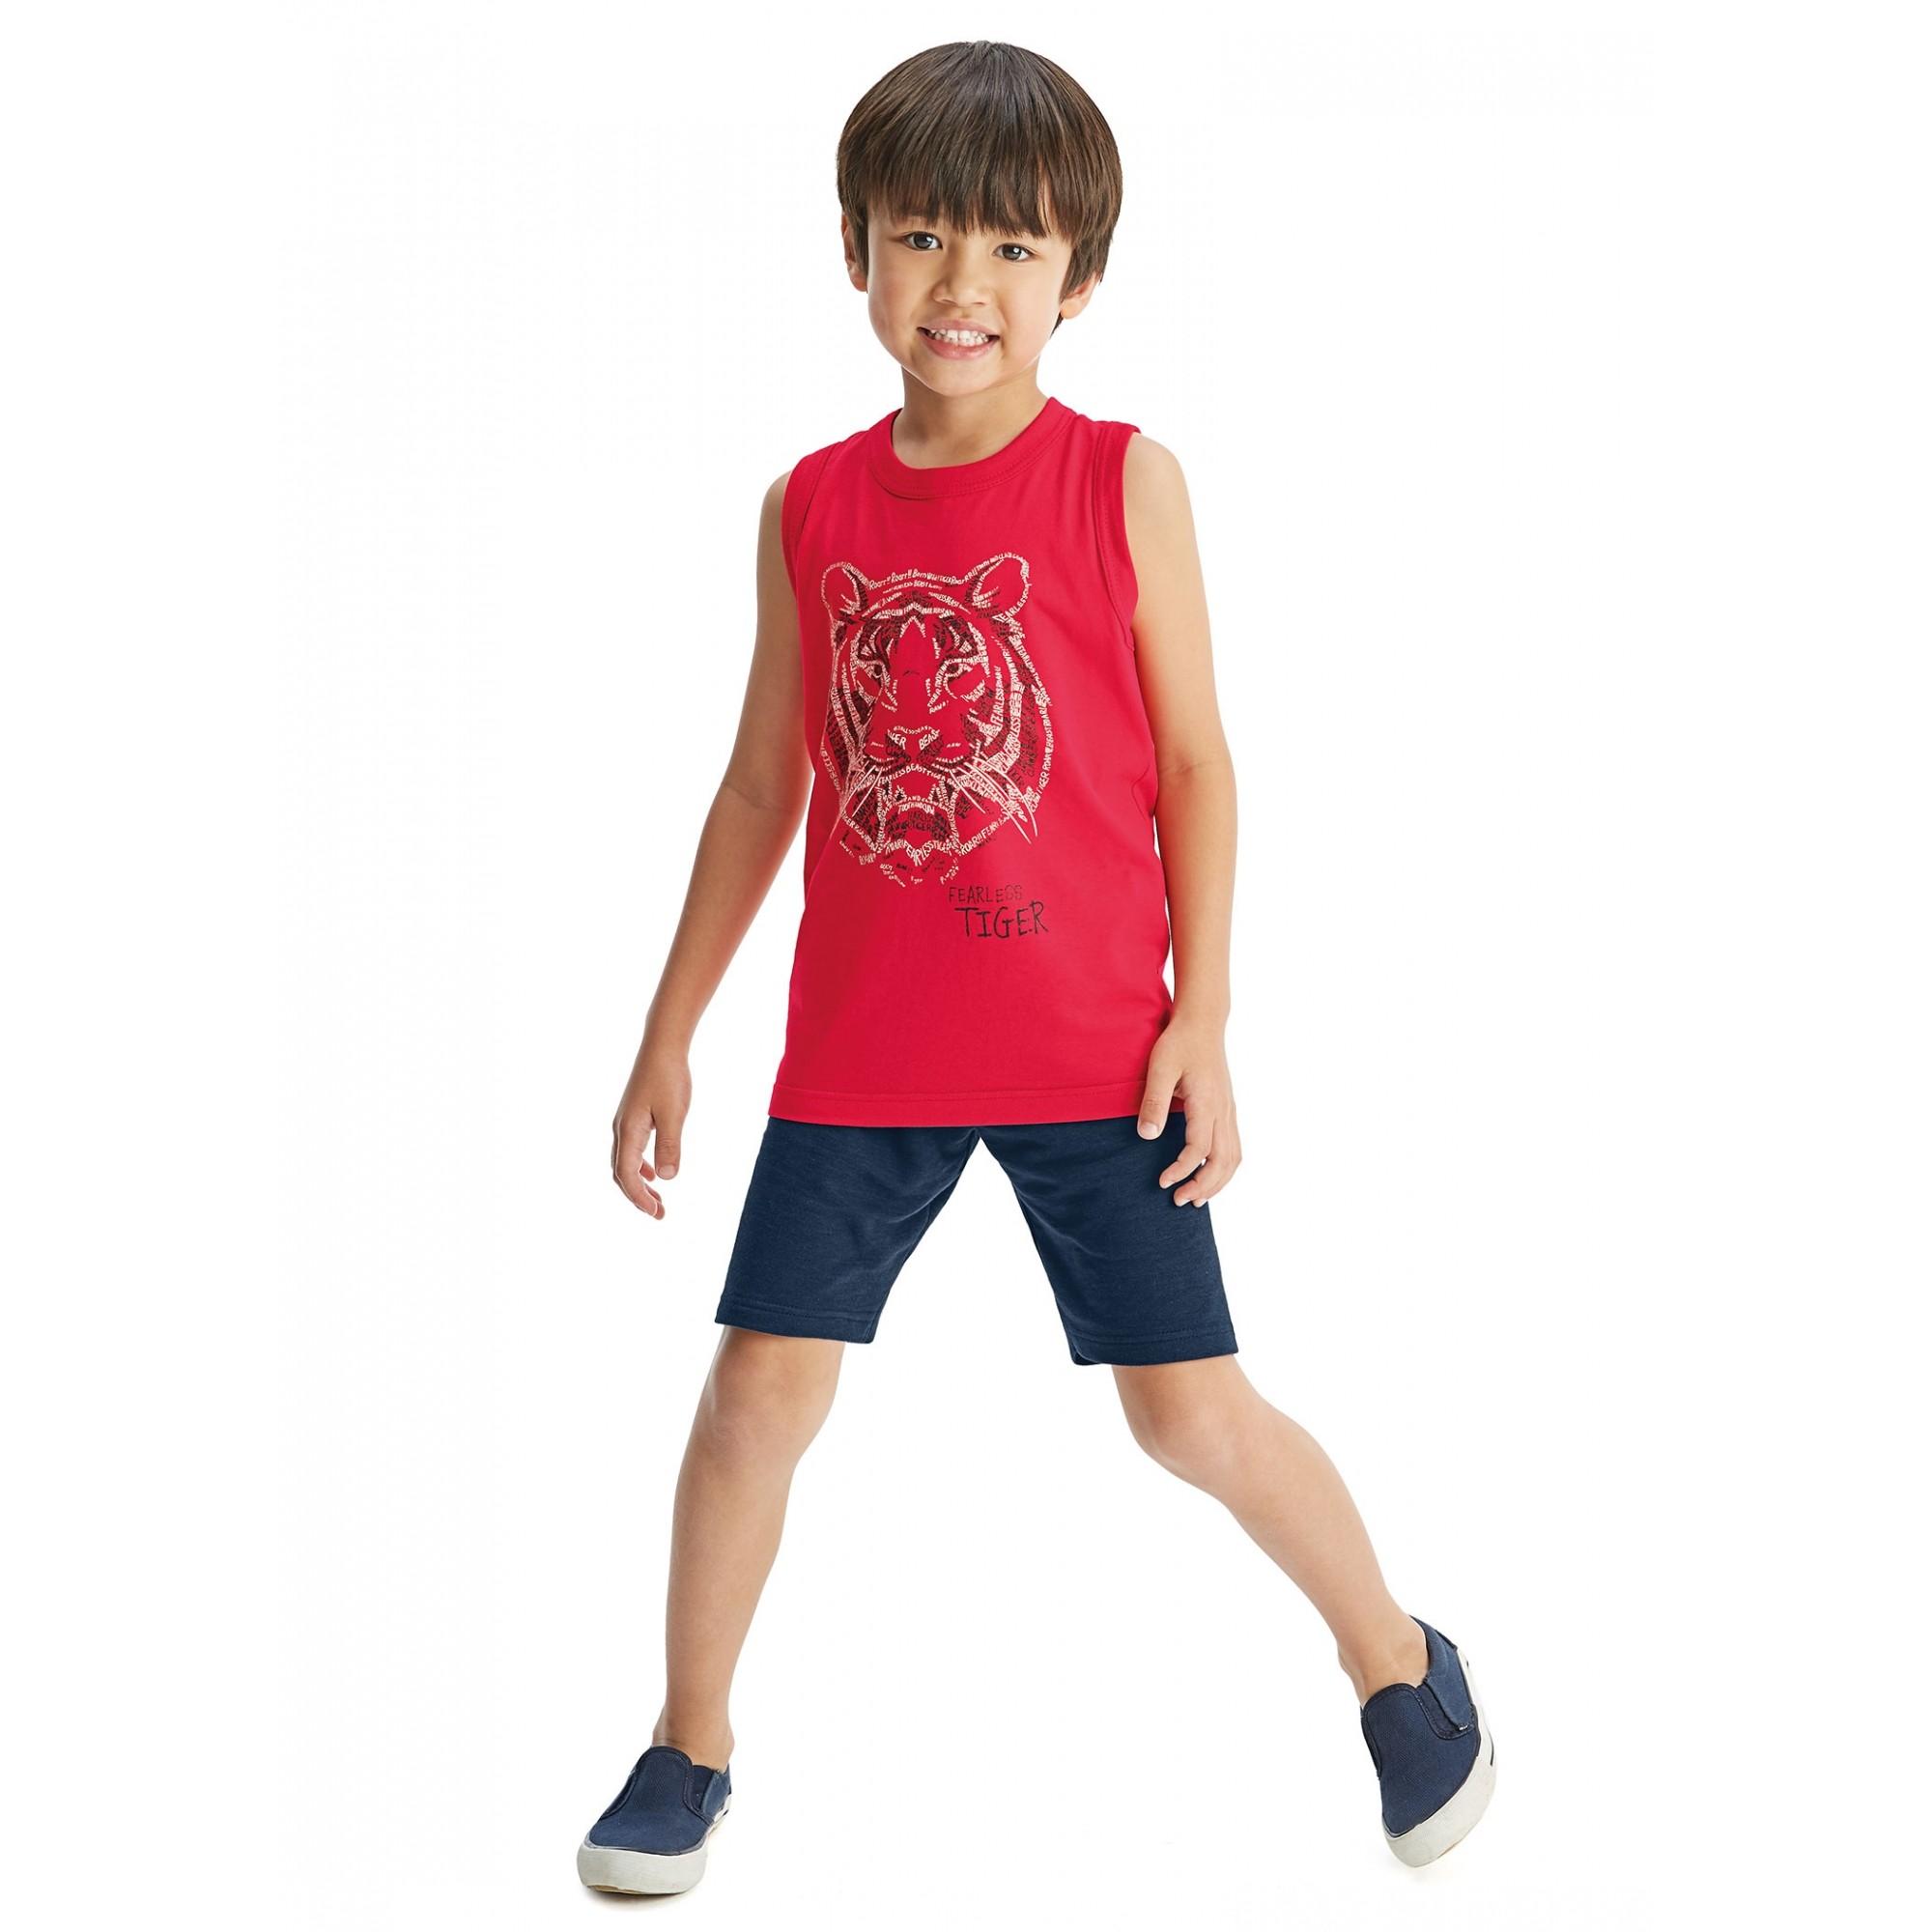 Camiseta Infantil Masculina Verão Vermelha Kit 3 Malwee